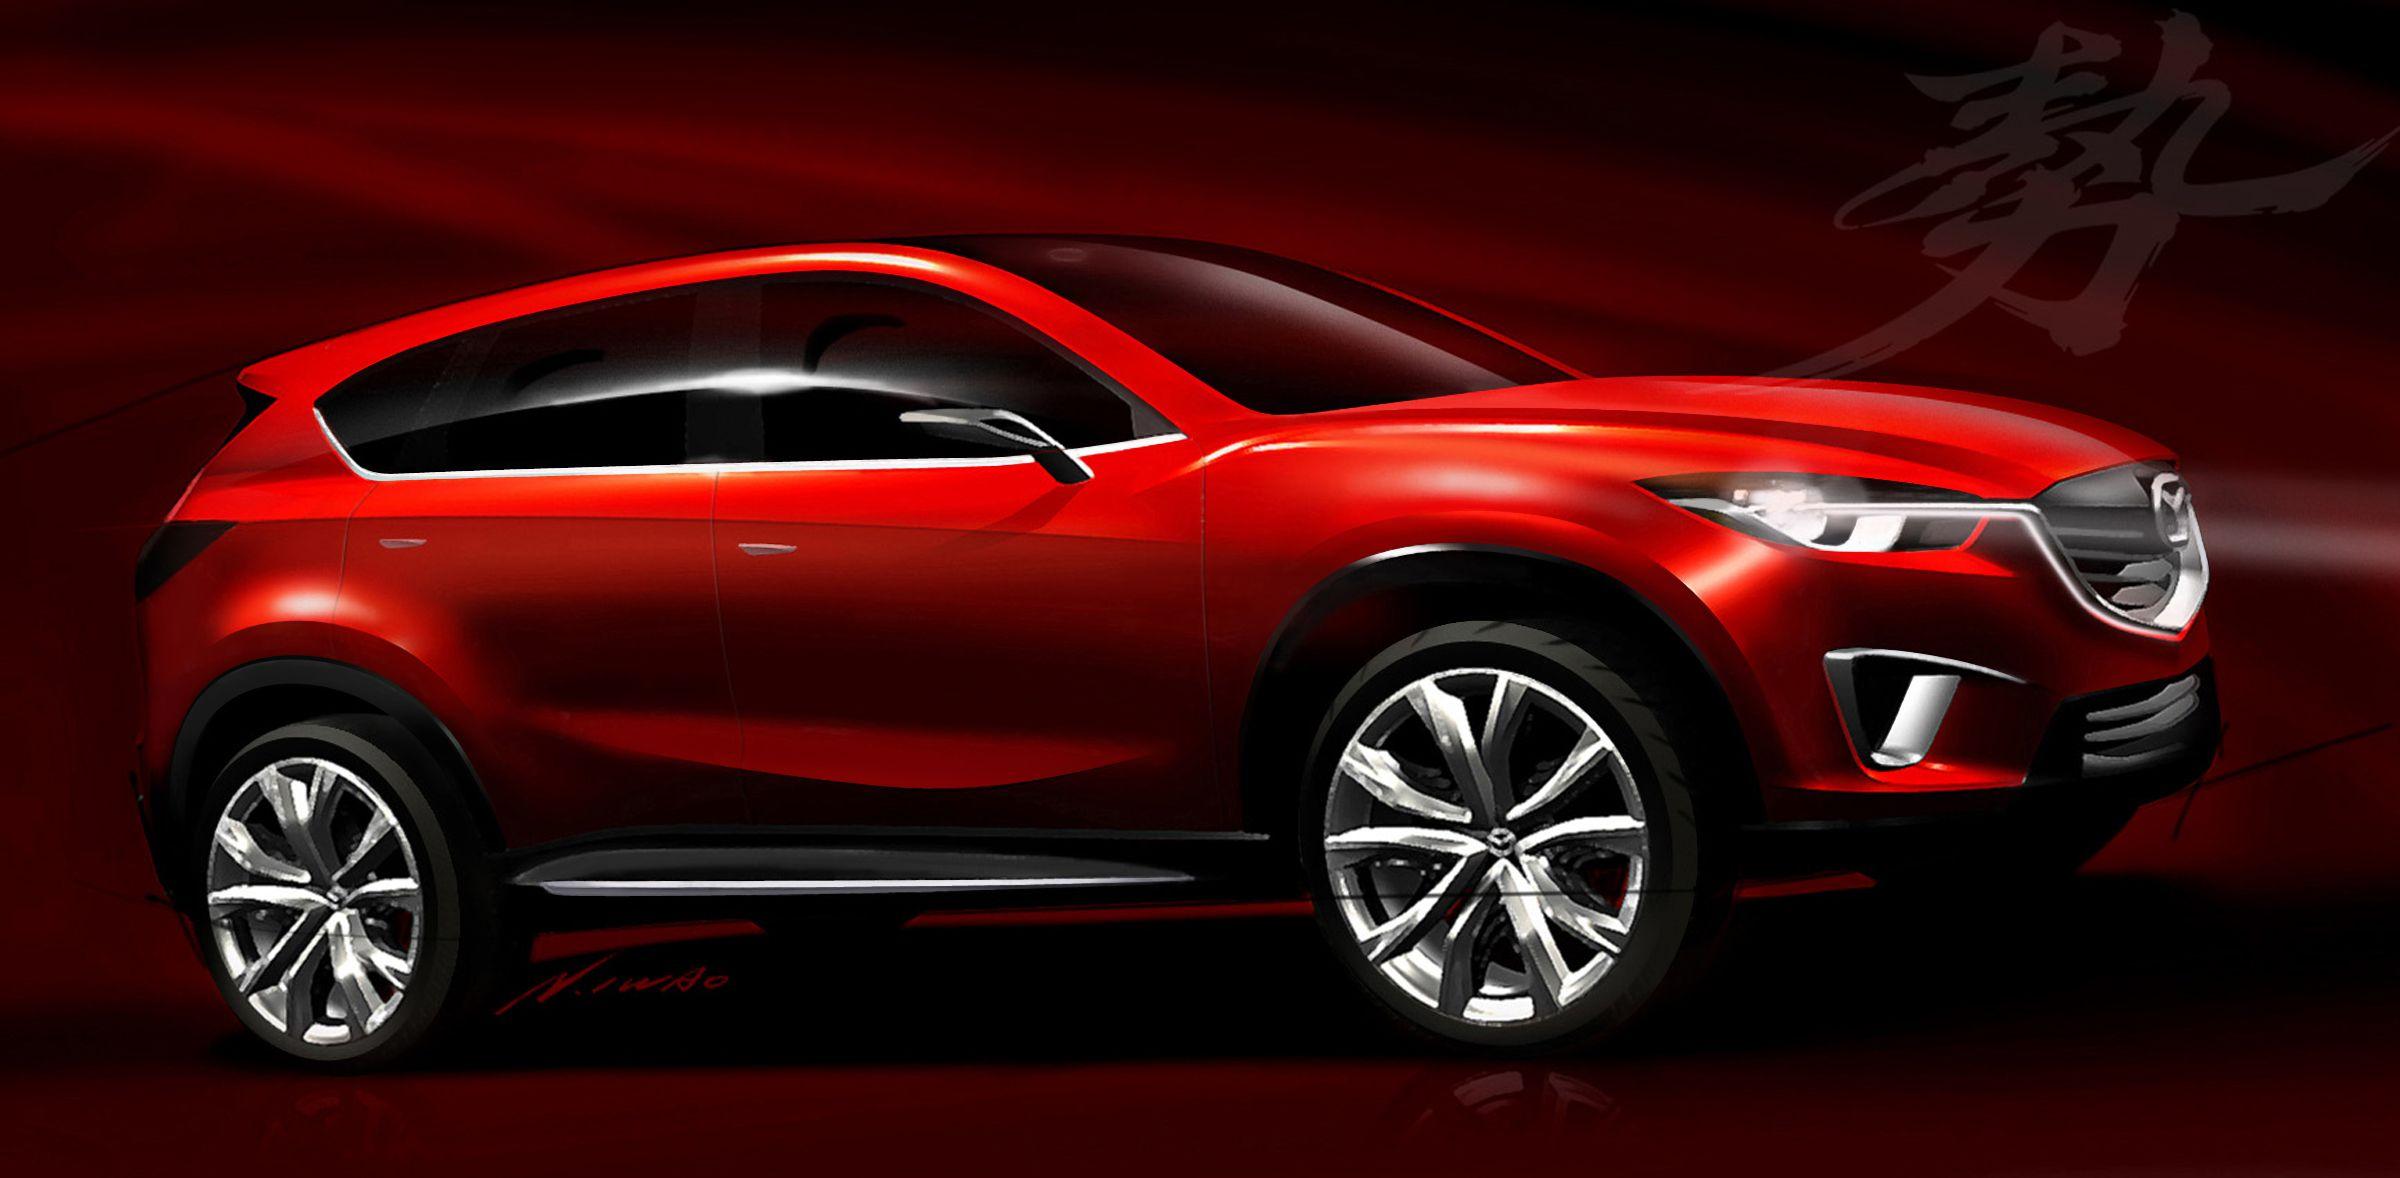 Mazda Minagi Concept: Can A Crossover Be Sexy?